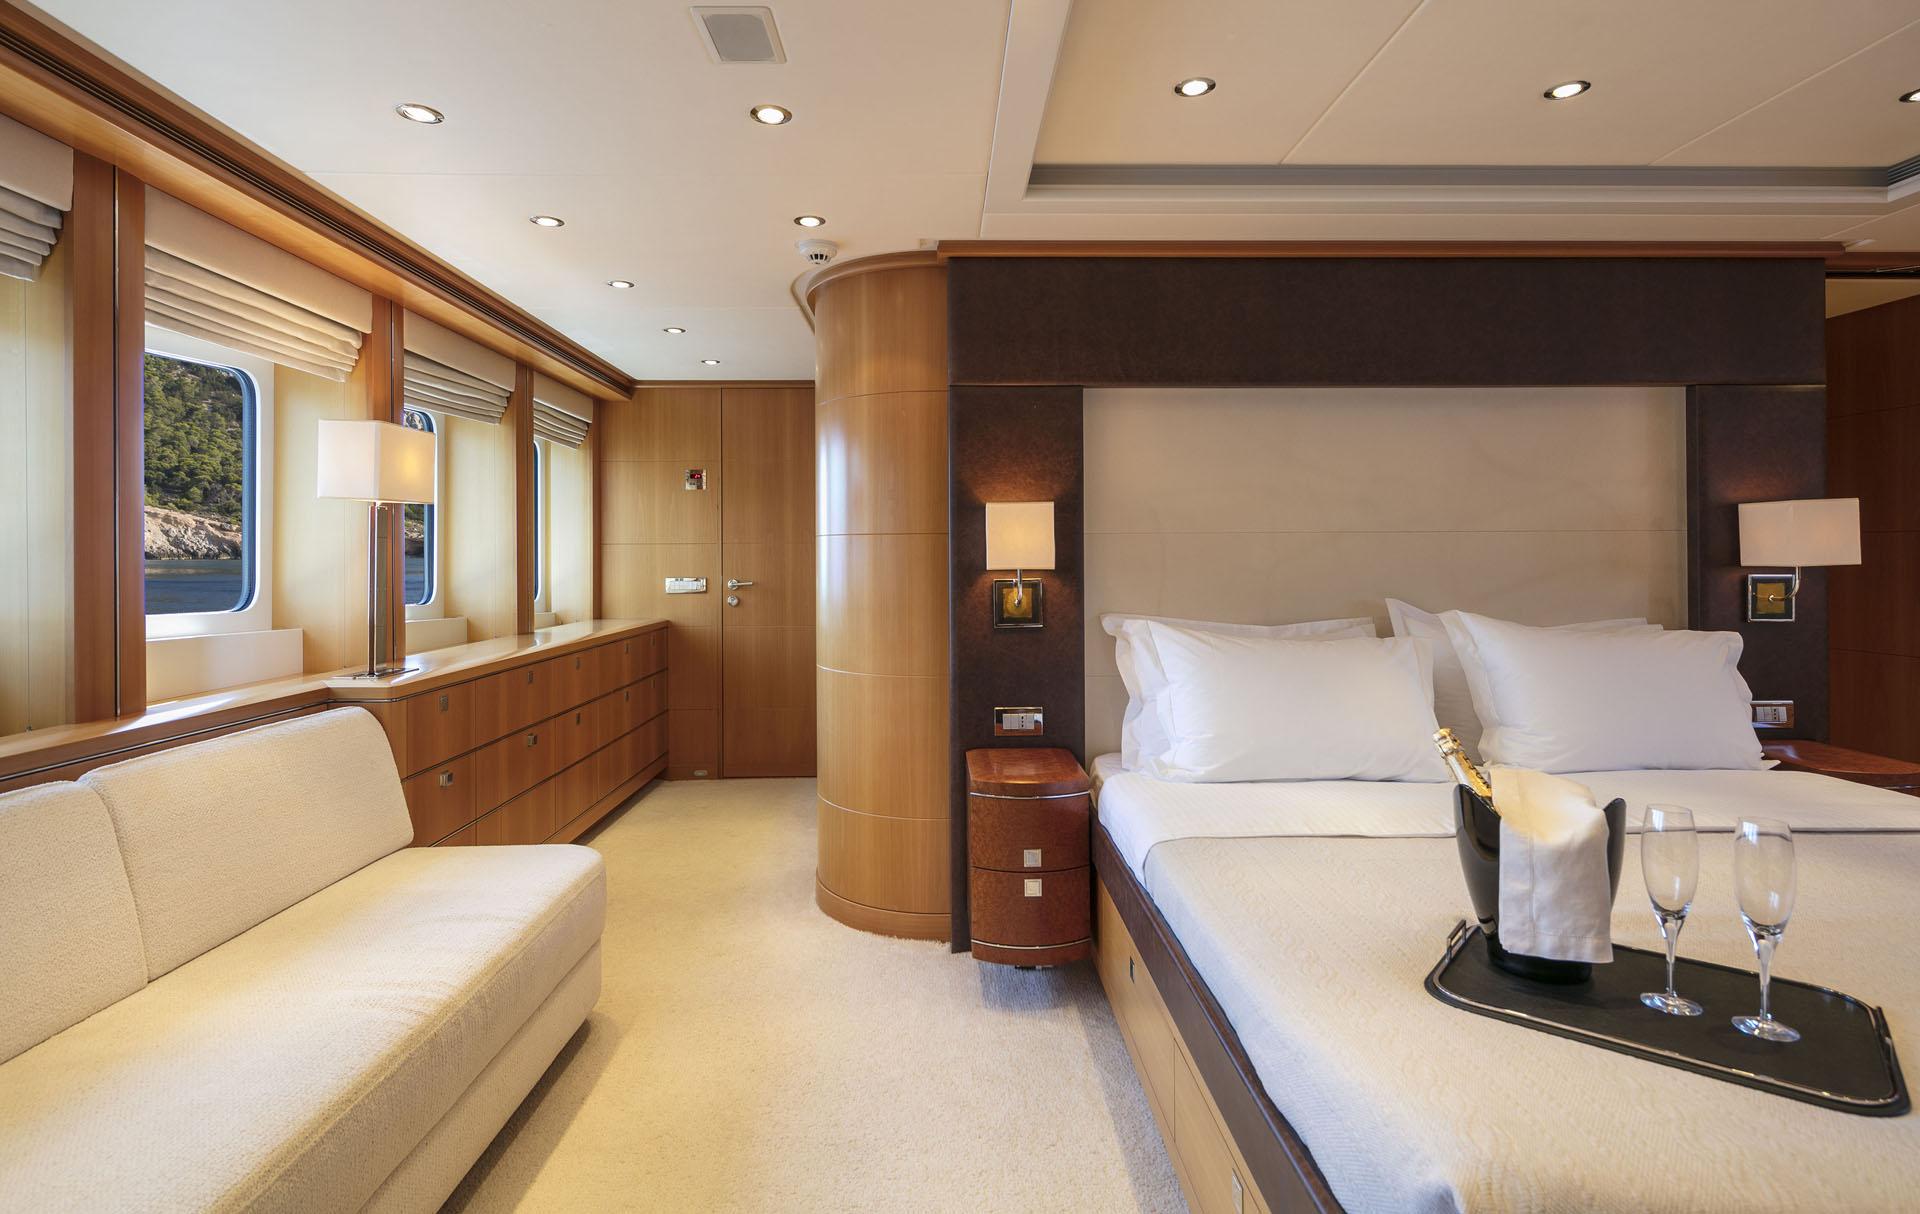 Motor yacht L'EQUINOX -  Master stateroom